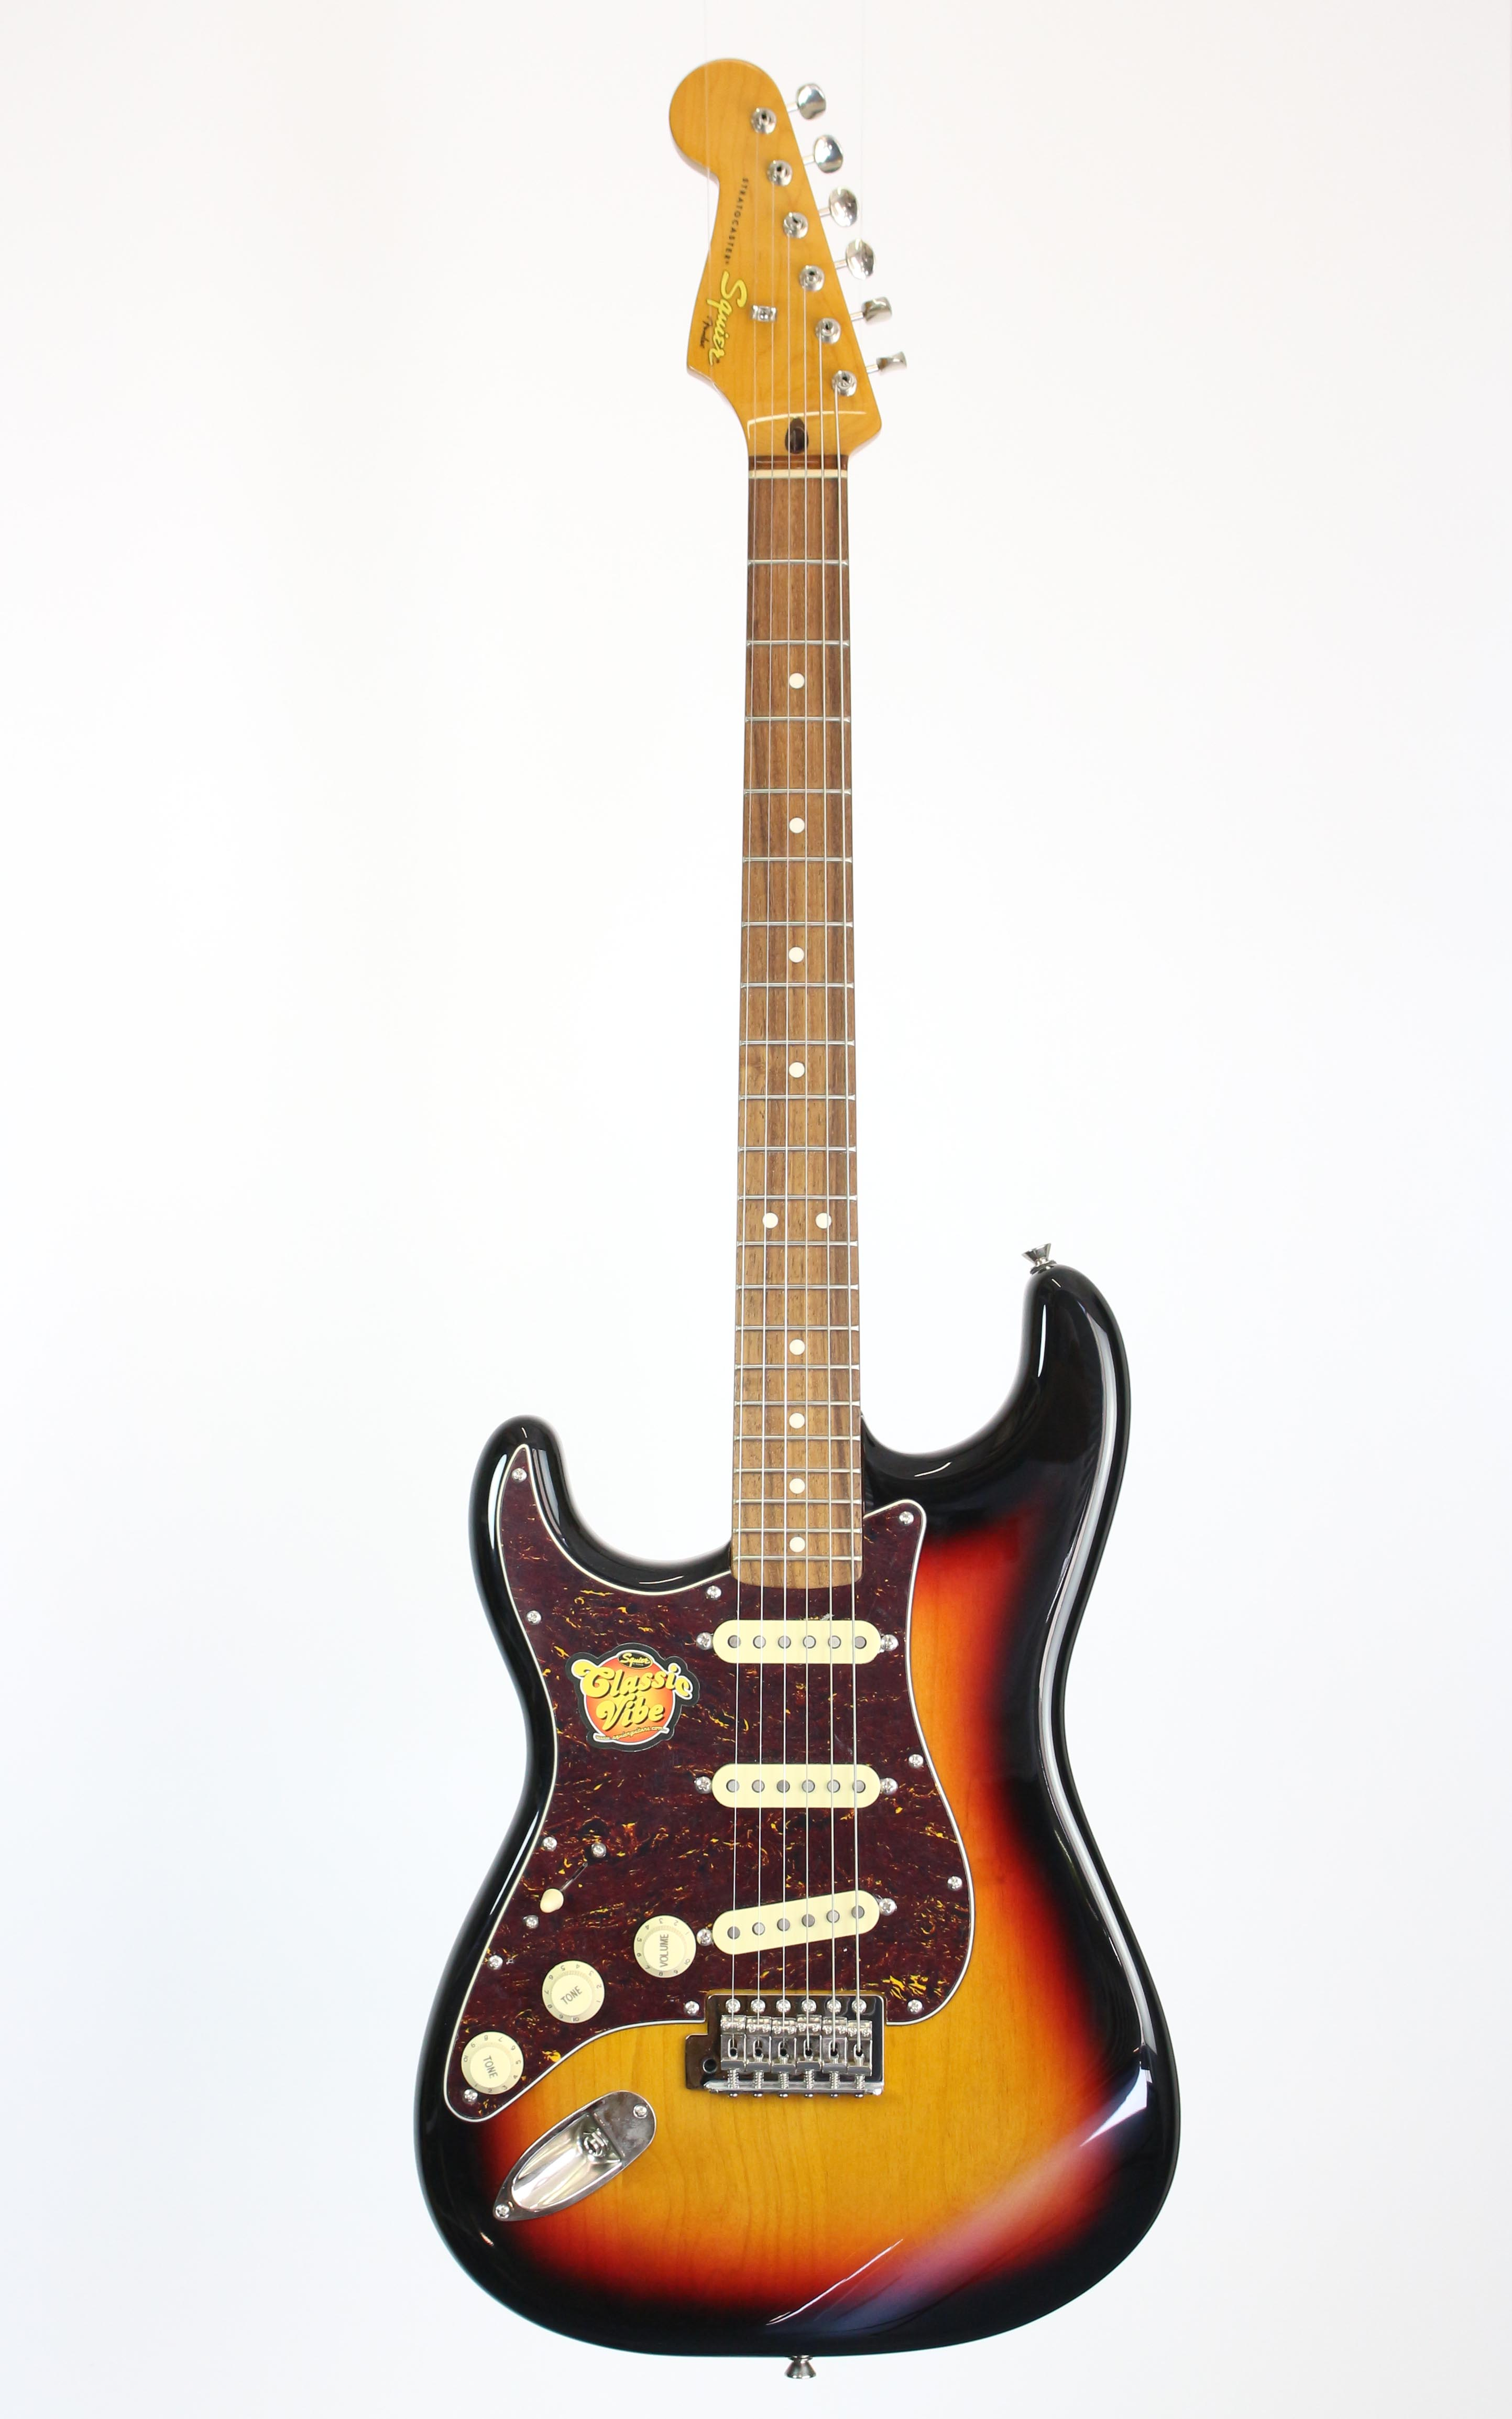 Fender Squier - Classic Vibe 60s Strat 3TS LH - Gitarren - E-Gitarren | MUSIK BERTRAM Deutschland Freiburg